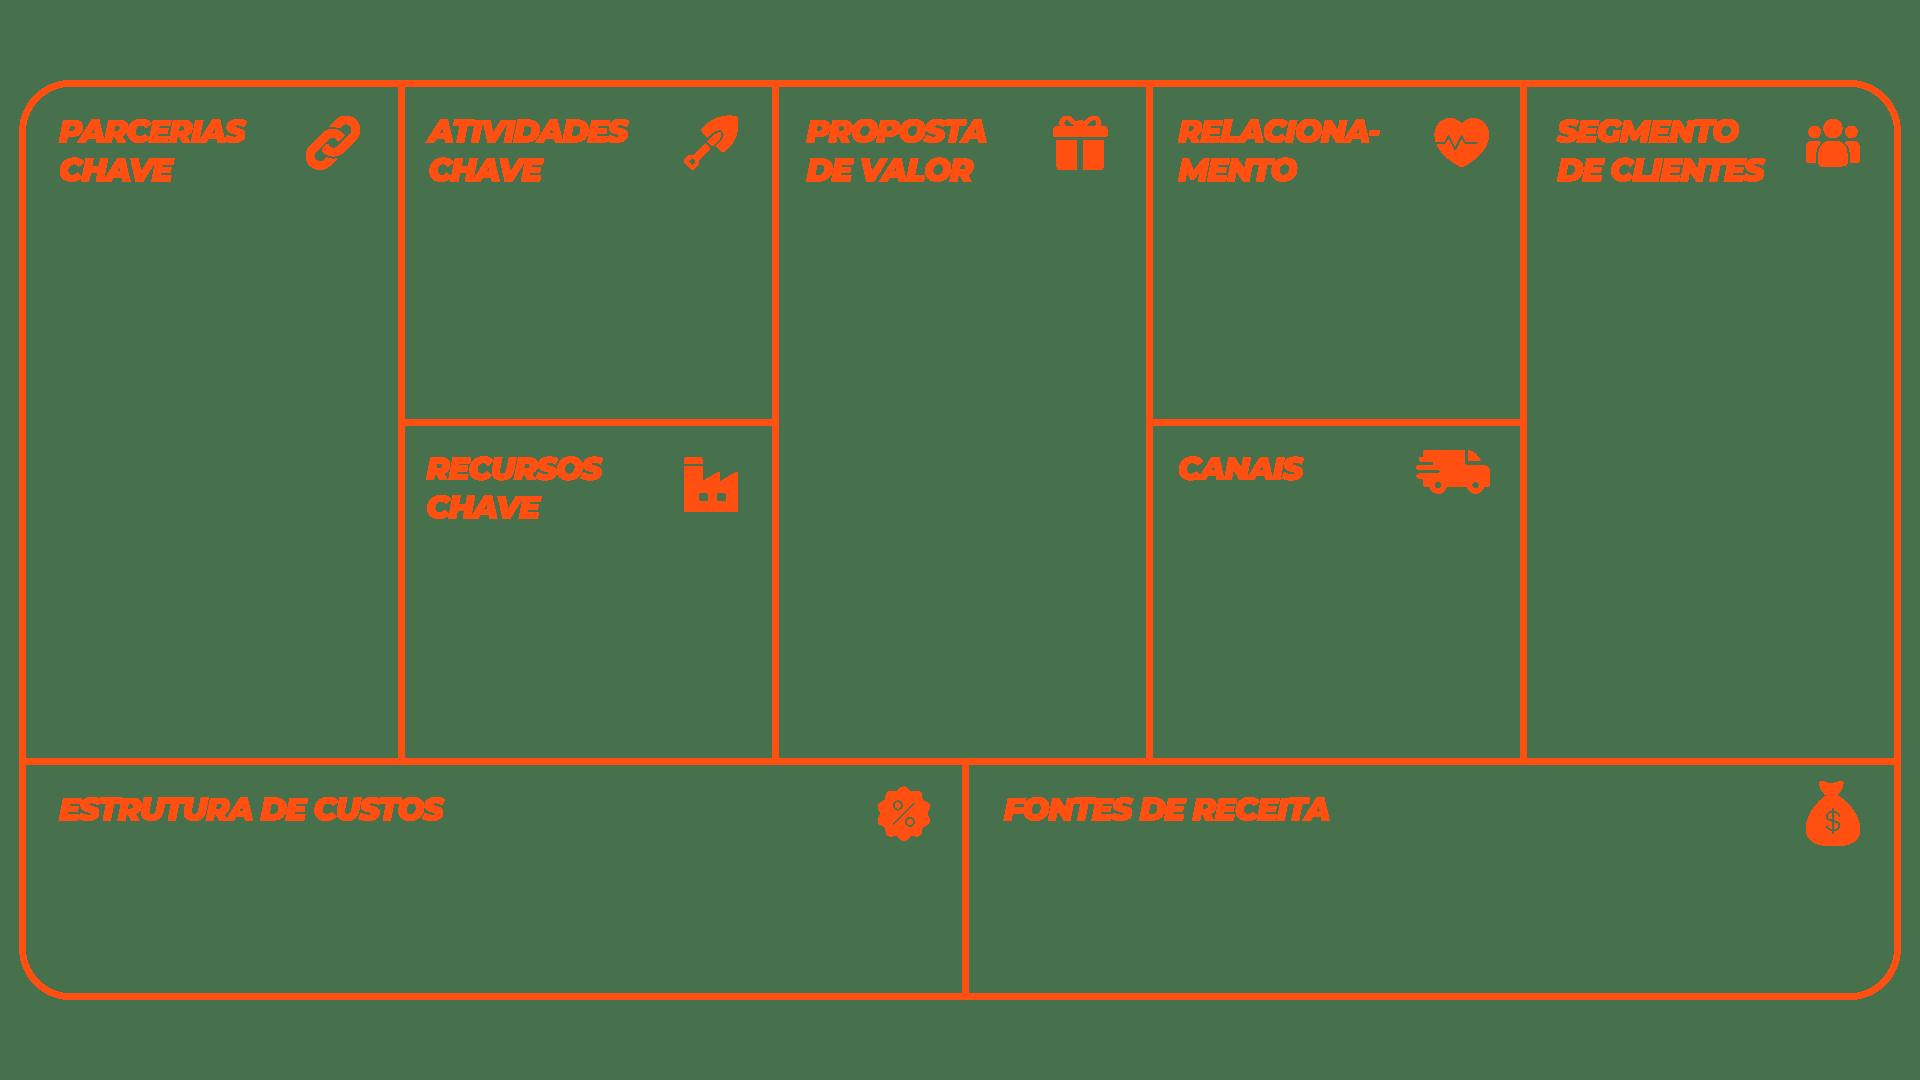 Estrutura business model canvas